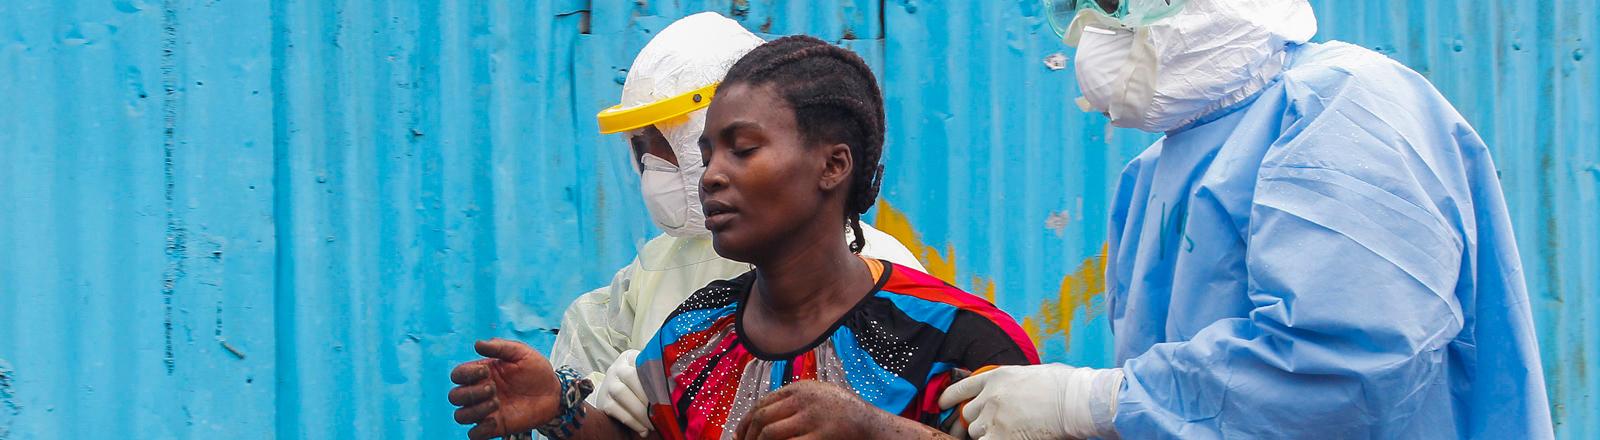 Zwei Helfer stützen eine an Ebola erkrankte Frau in Liberia